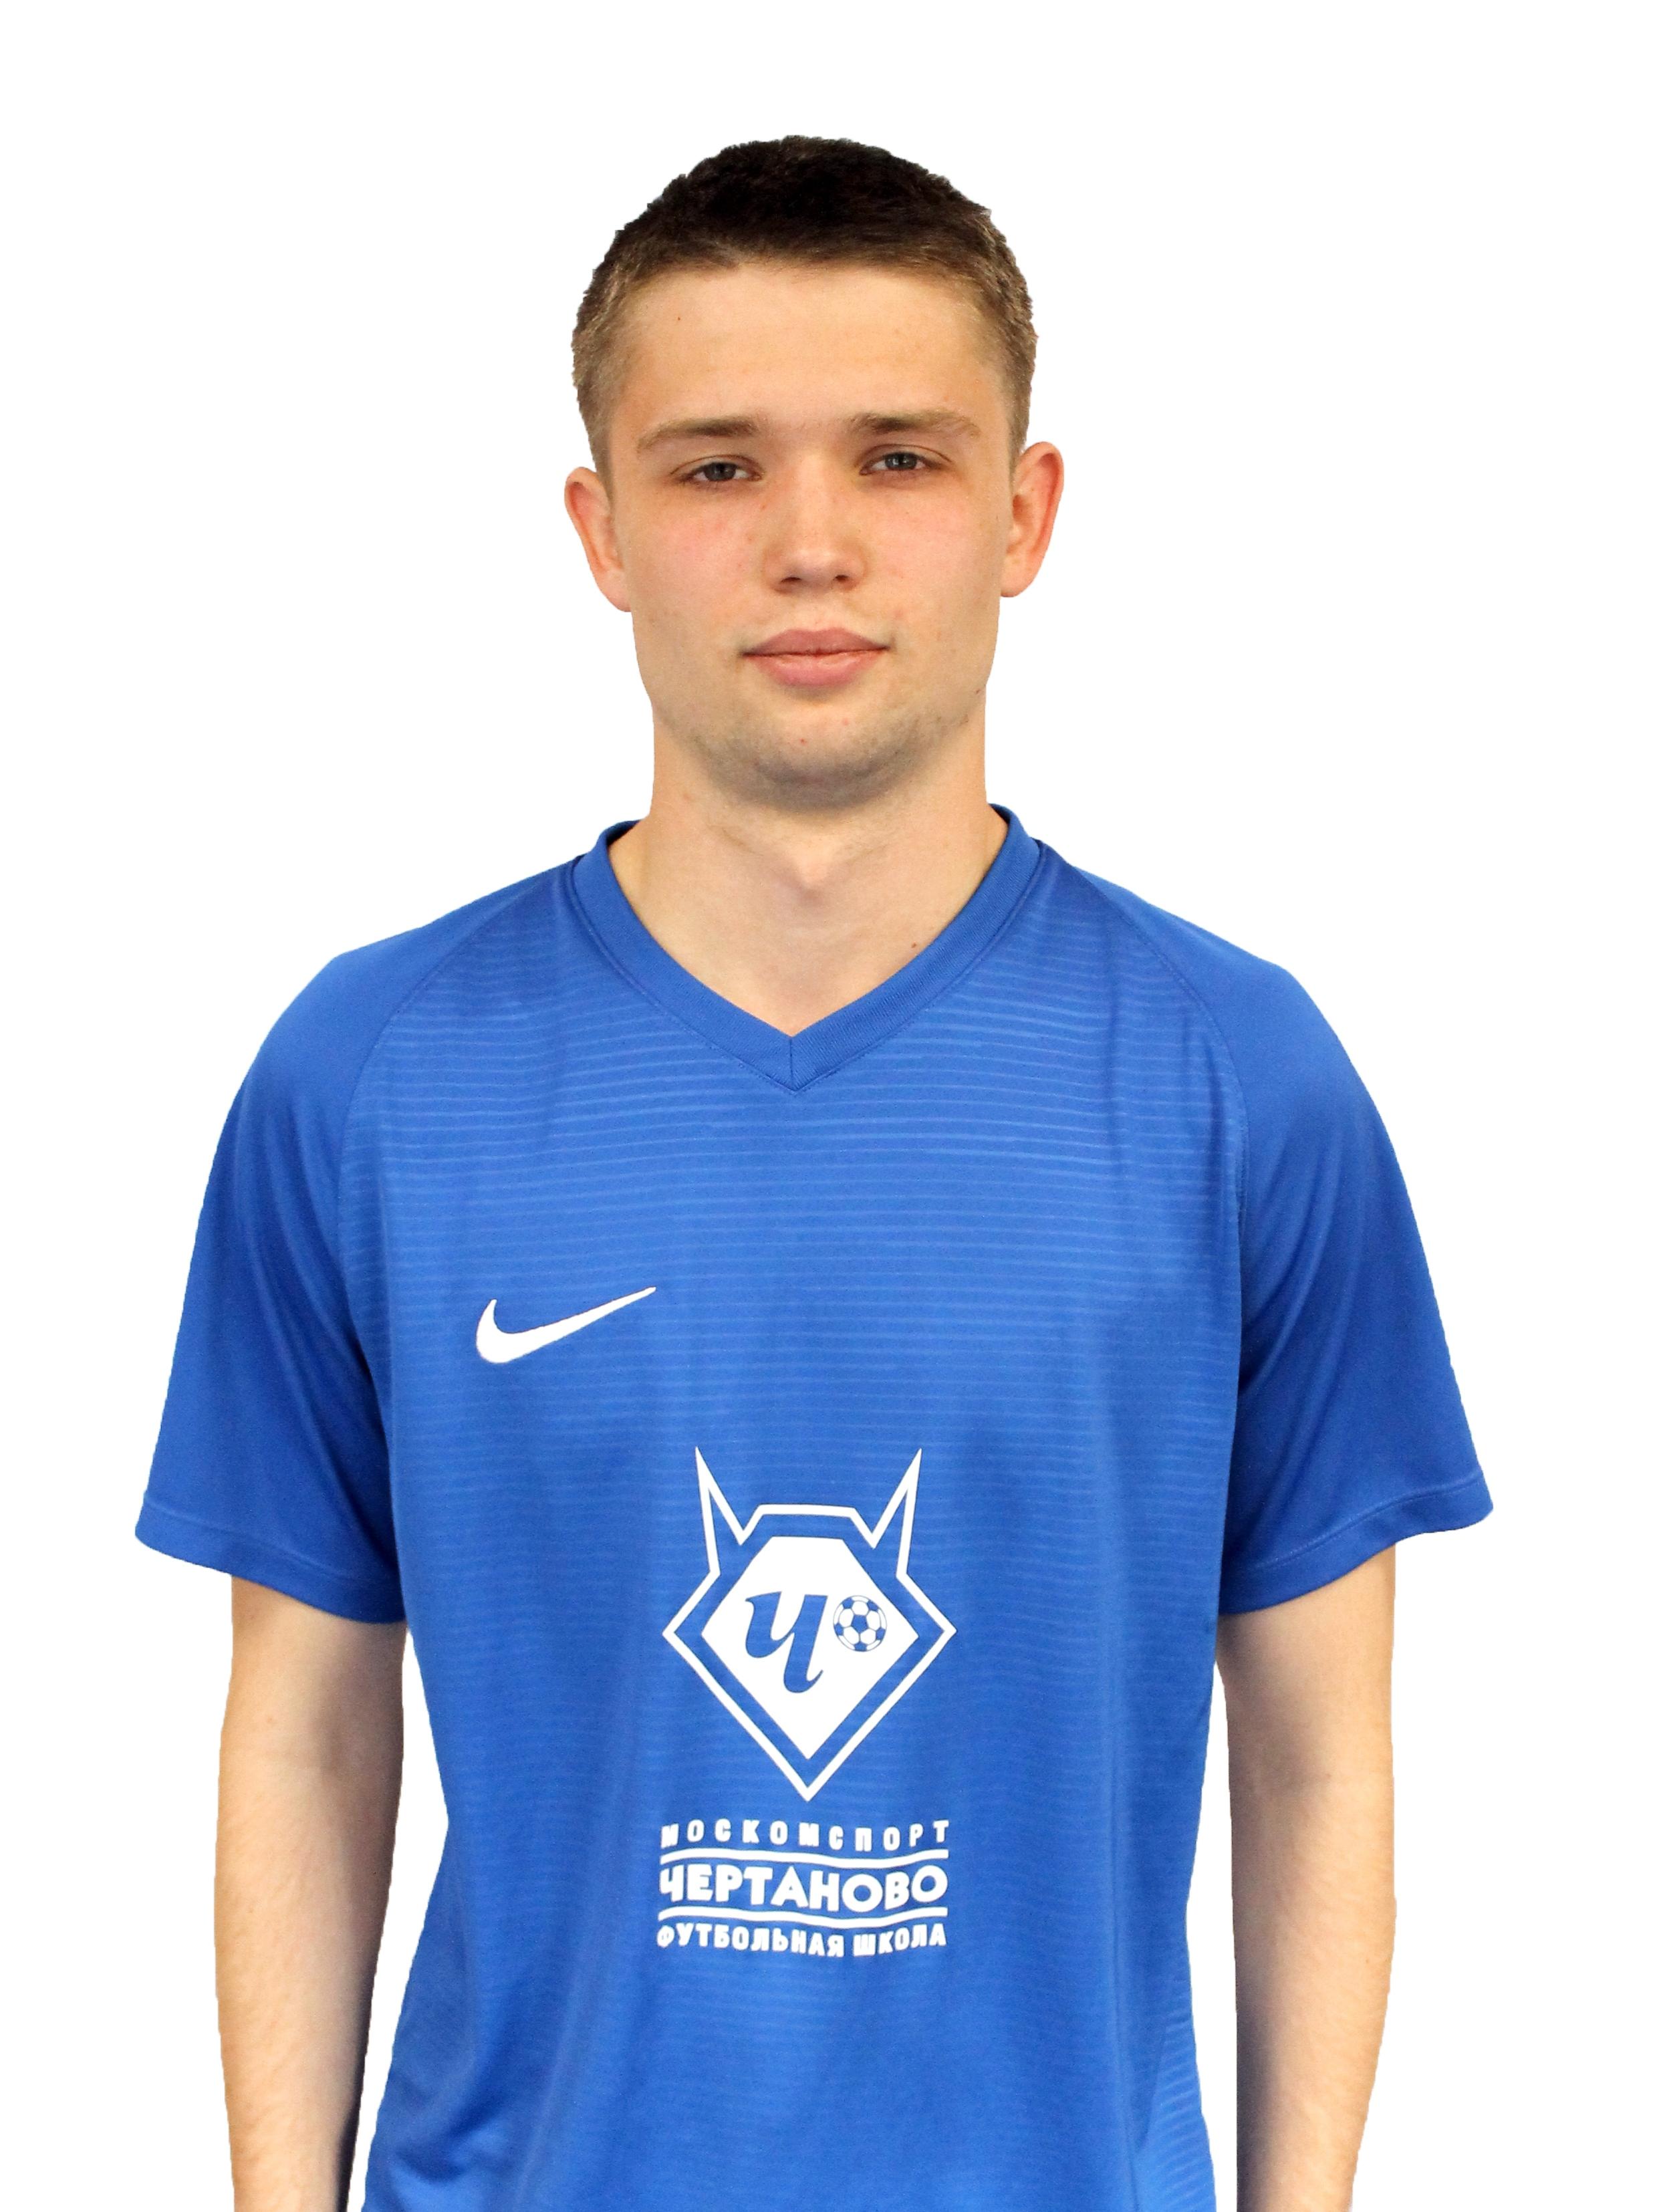 Епифанов Данил Михайлович